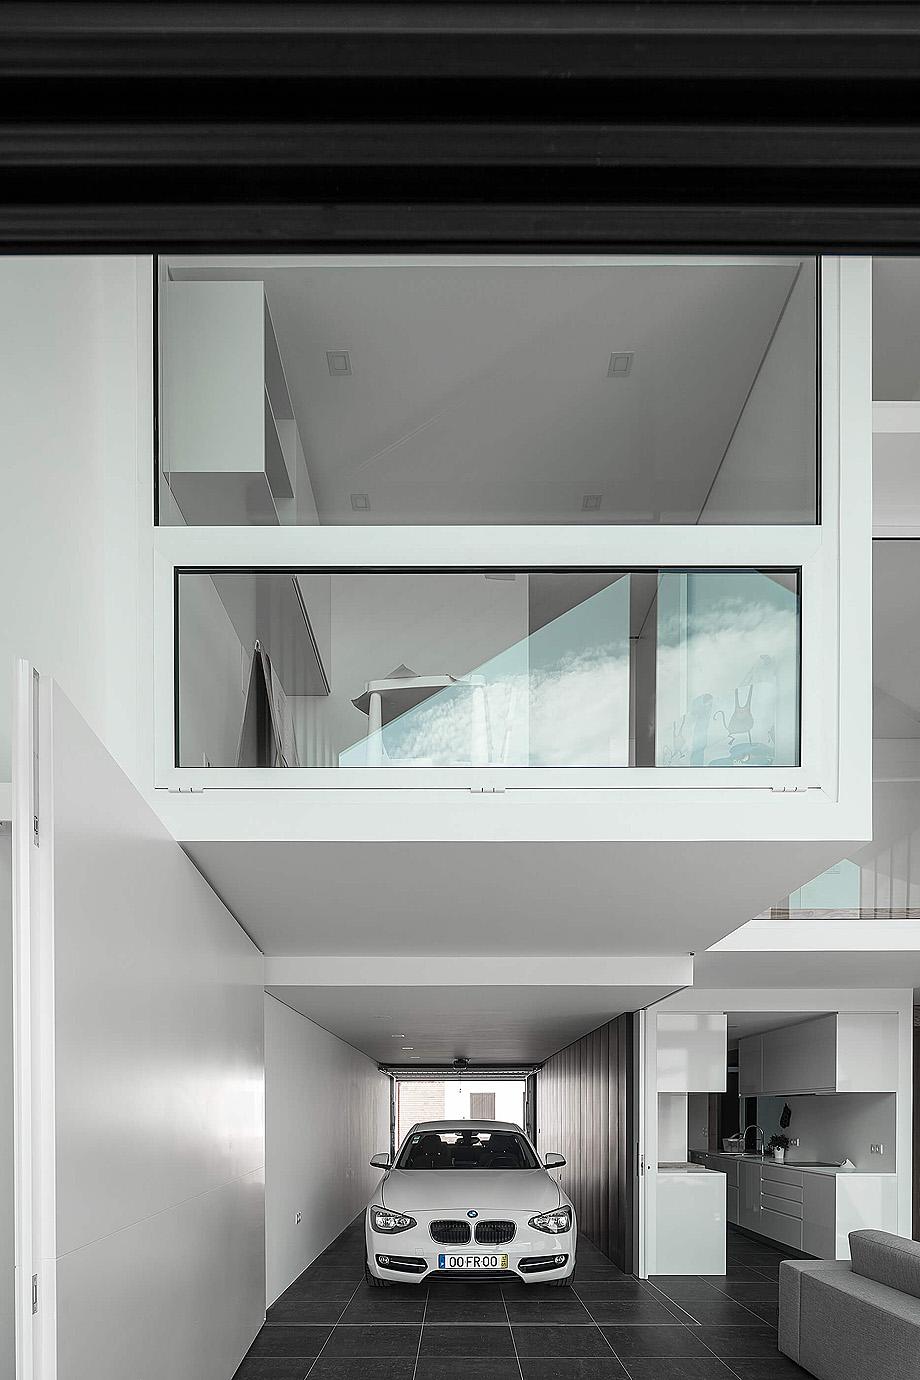 casa do arco de frari architecture network - foto ivo tavares (13)